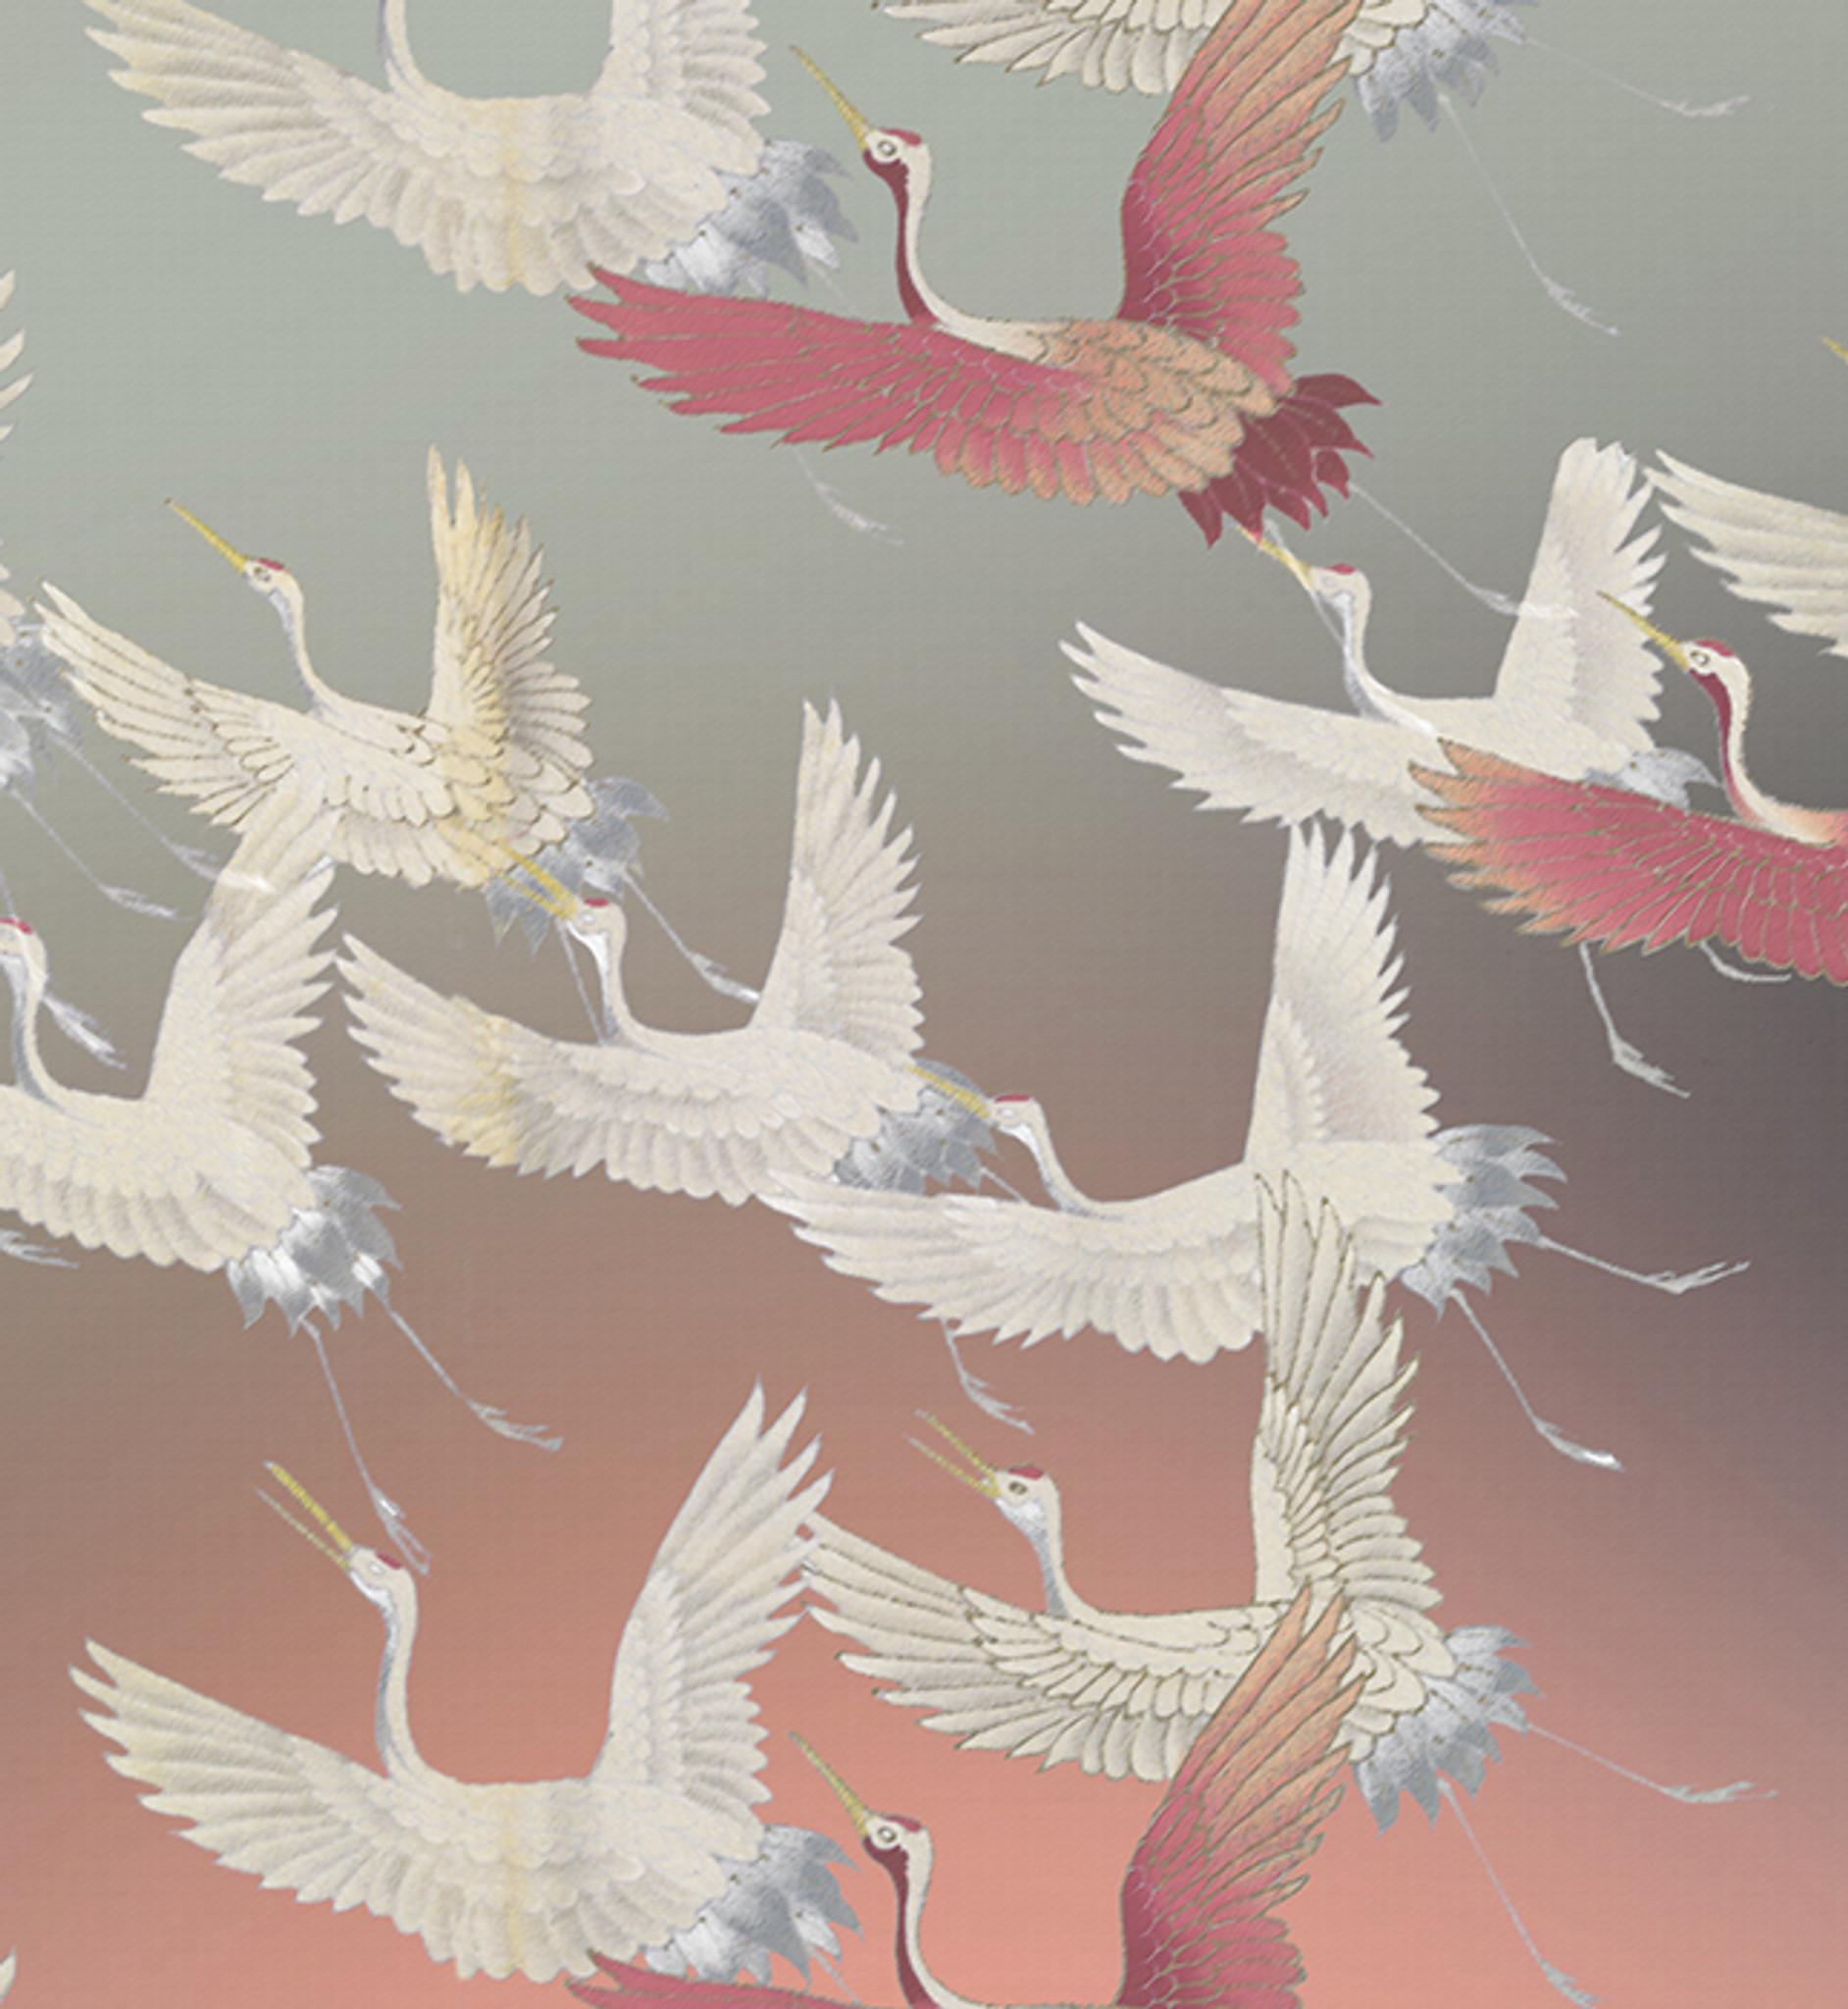 Fabric - Ryokan Dreaming - Cranes in Flight Pink